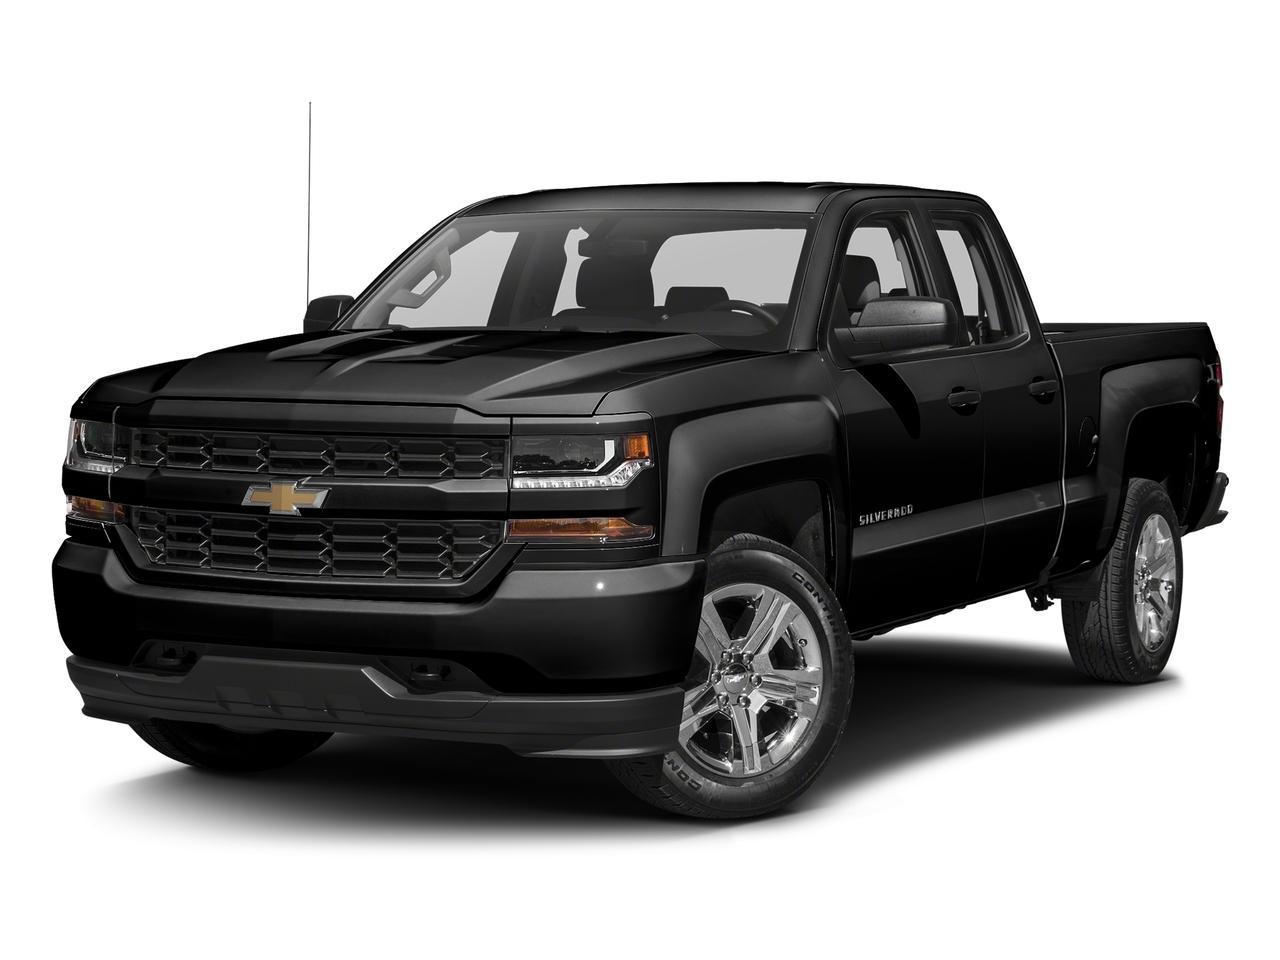 2016 Chevrolet Silverado 1500 Vehicle Photo in Friendswood, TX 77546